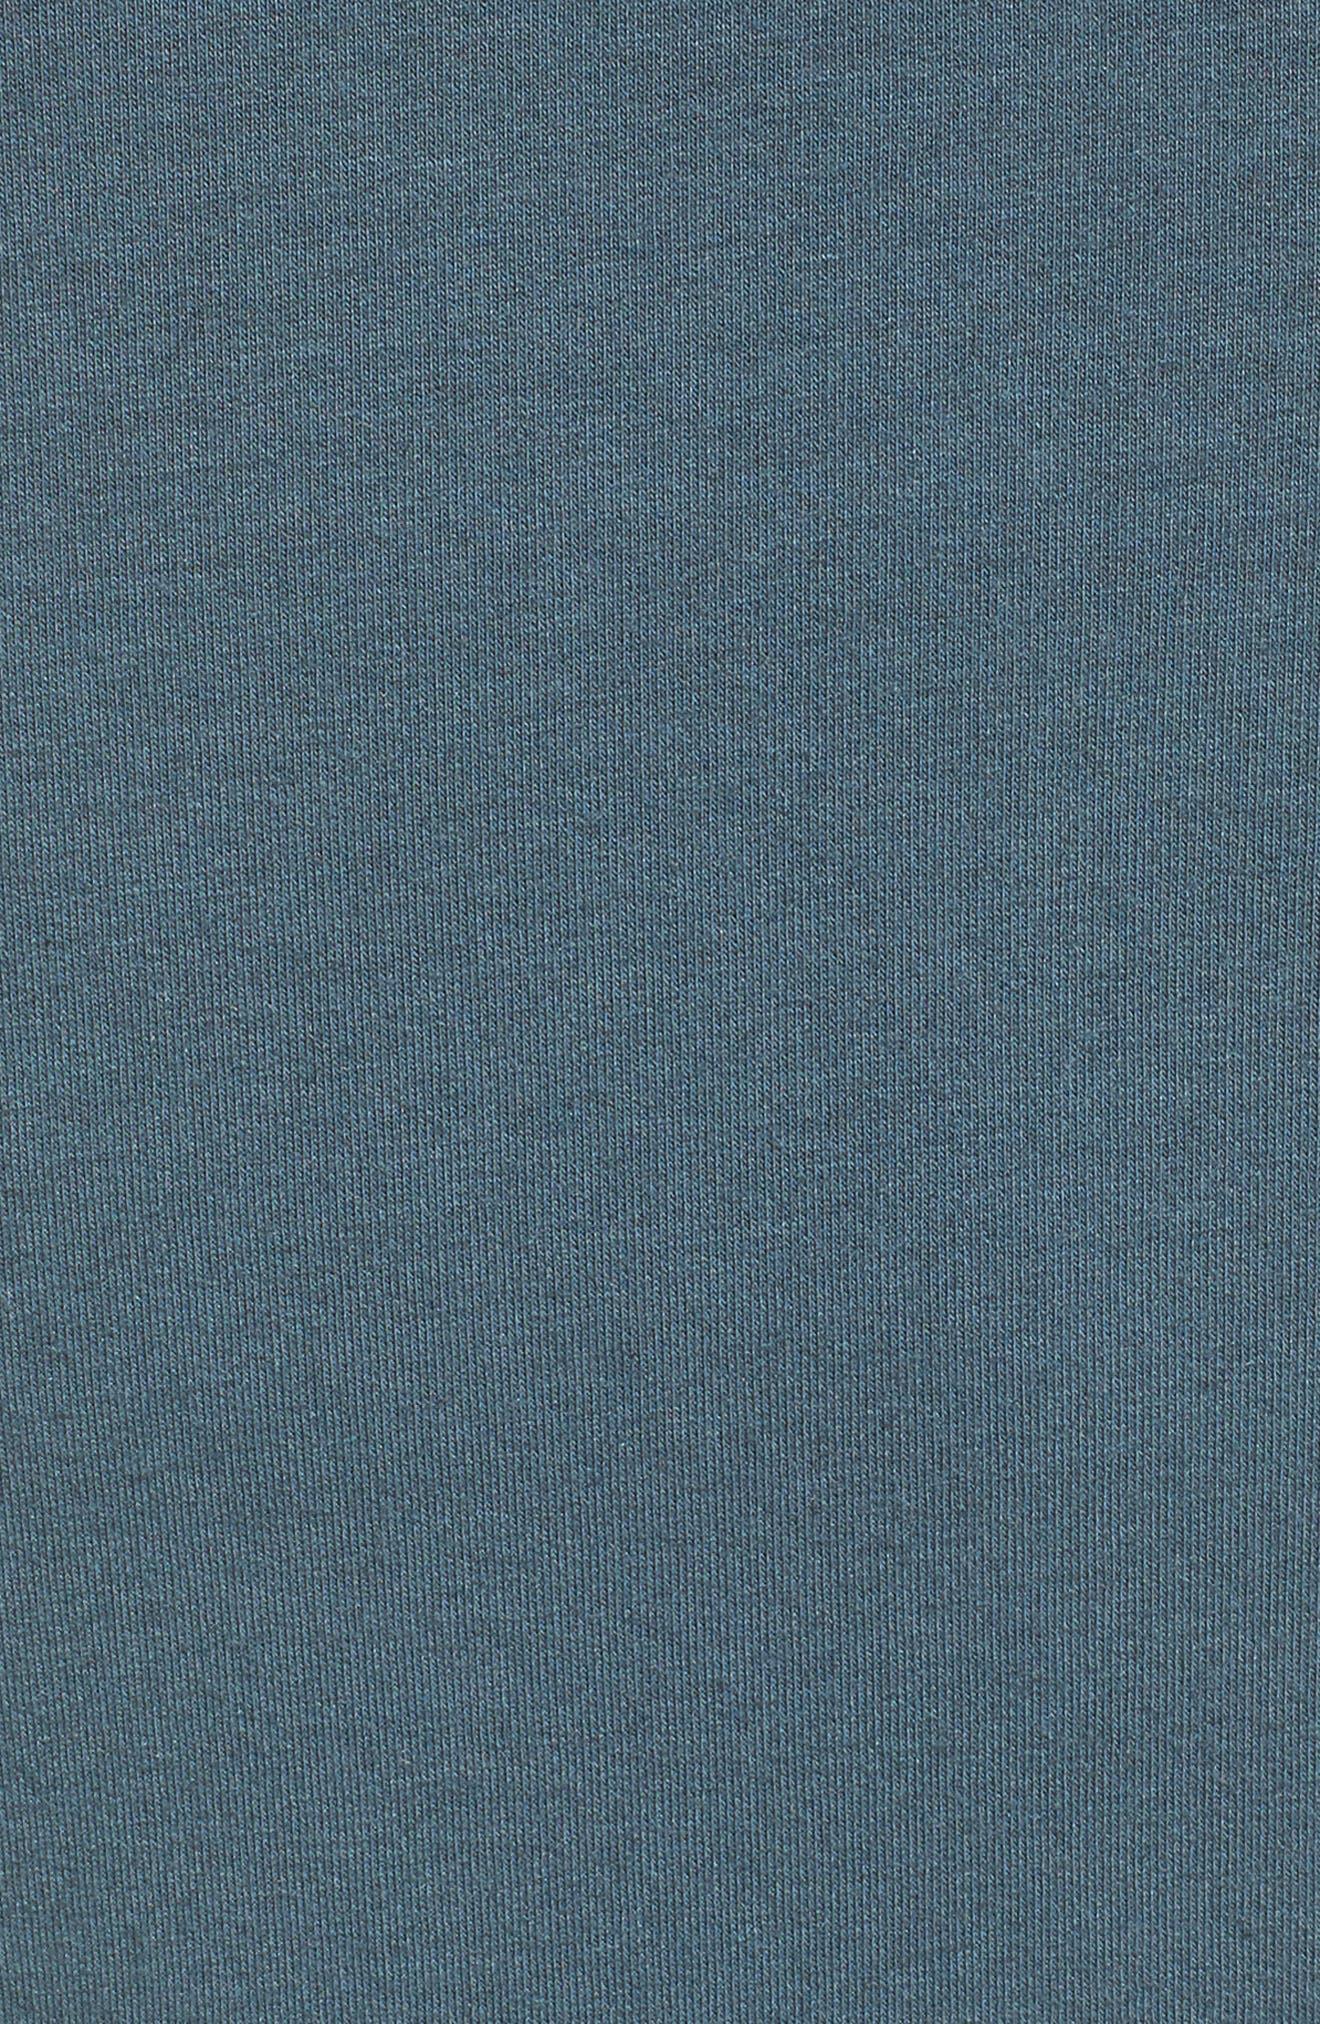 May Contain Wine Crop Sweatshirt,                             Alternate thumbnail 5, color,                             024